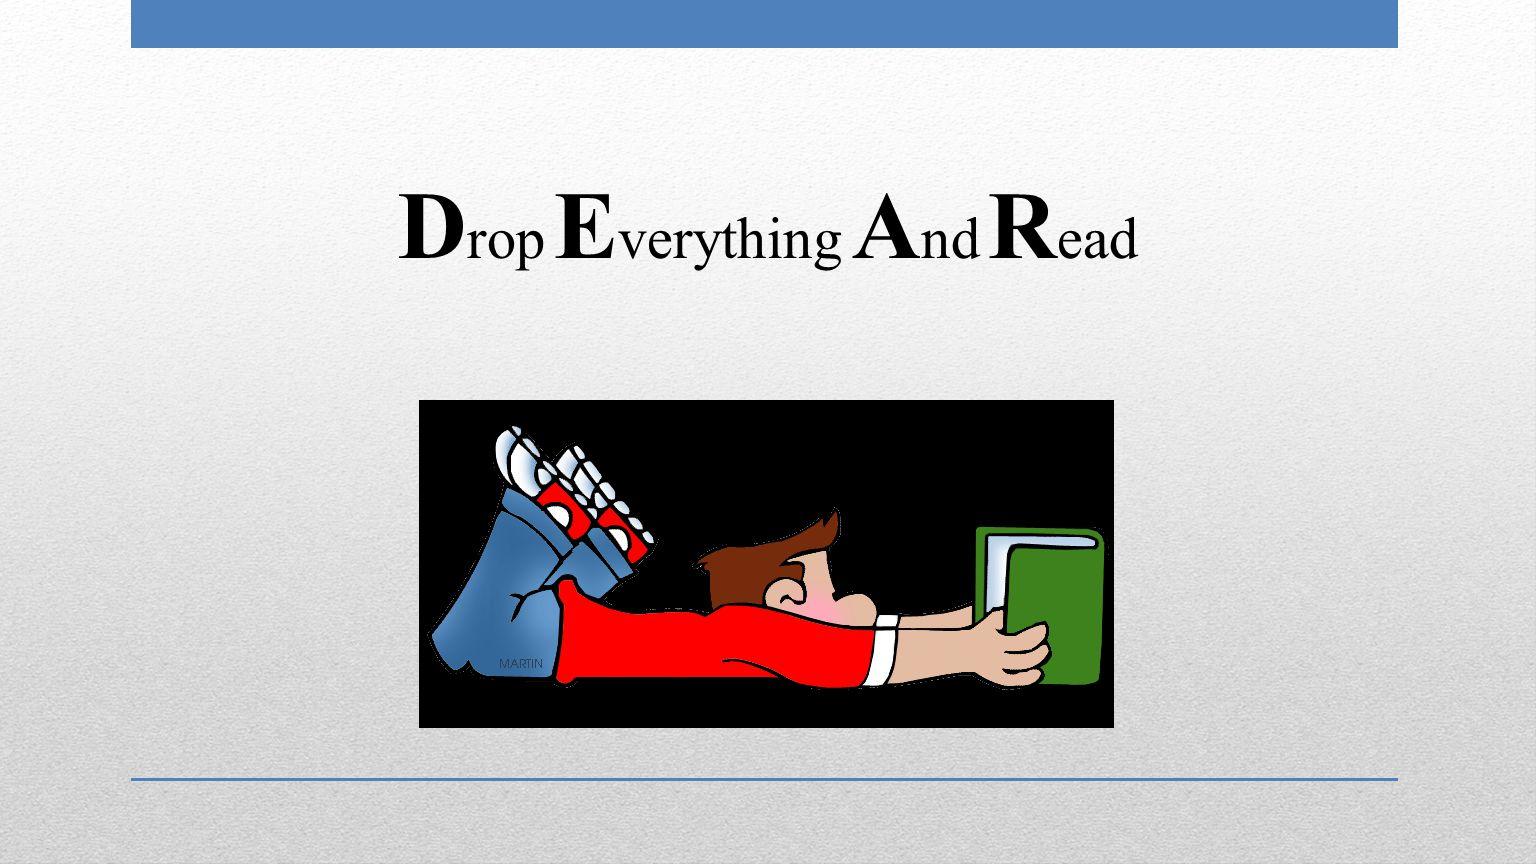 D rop E verything A nd R ead